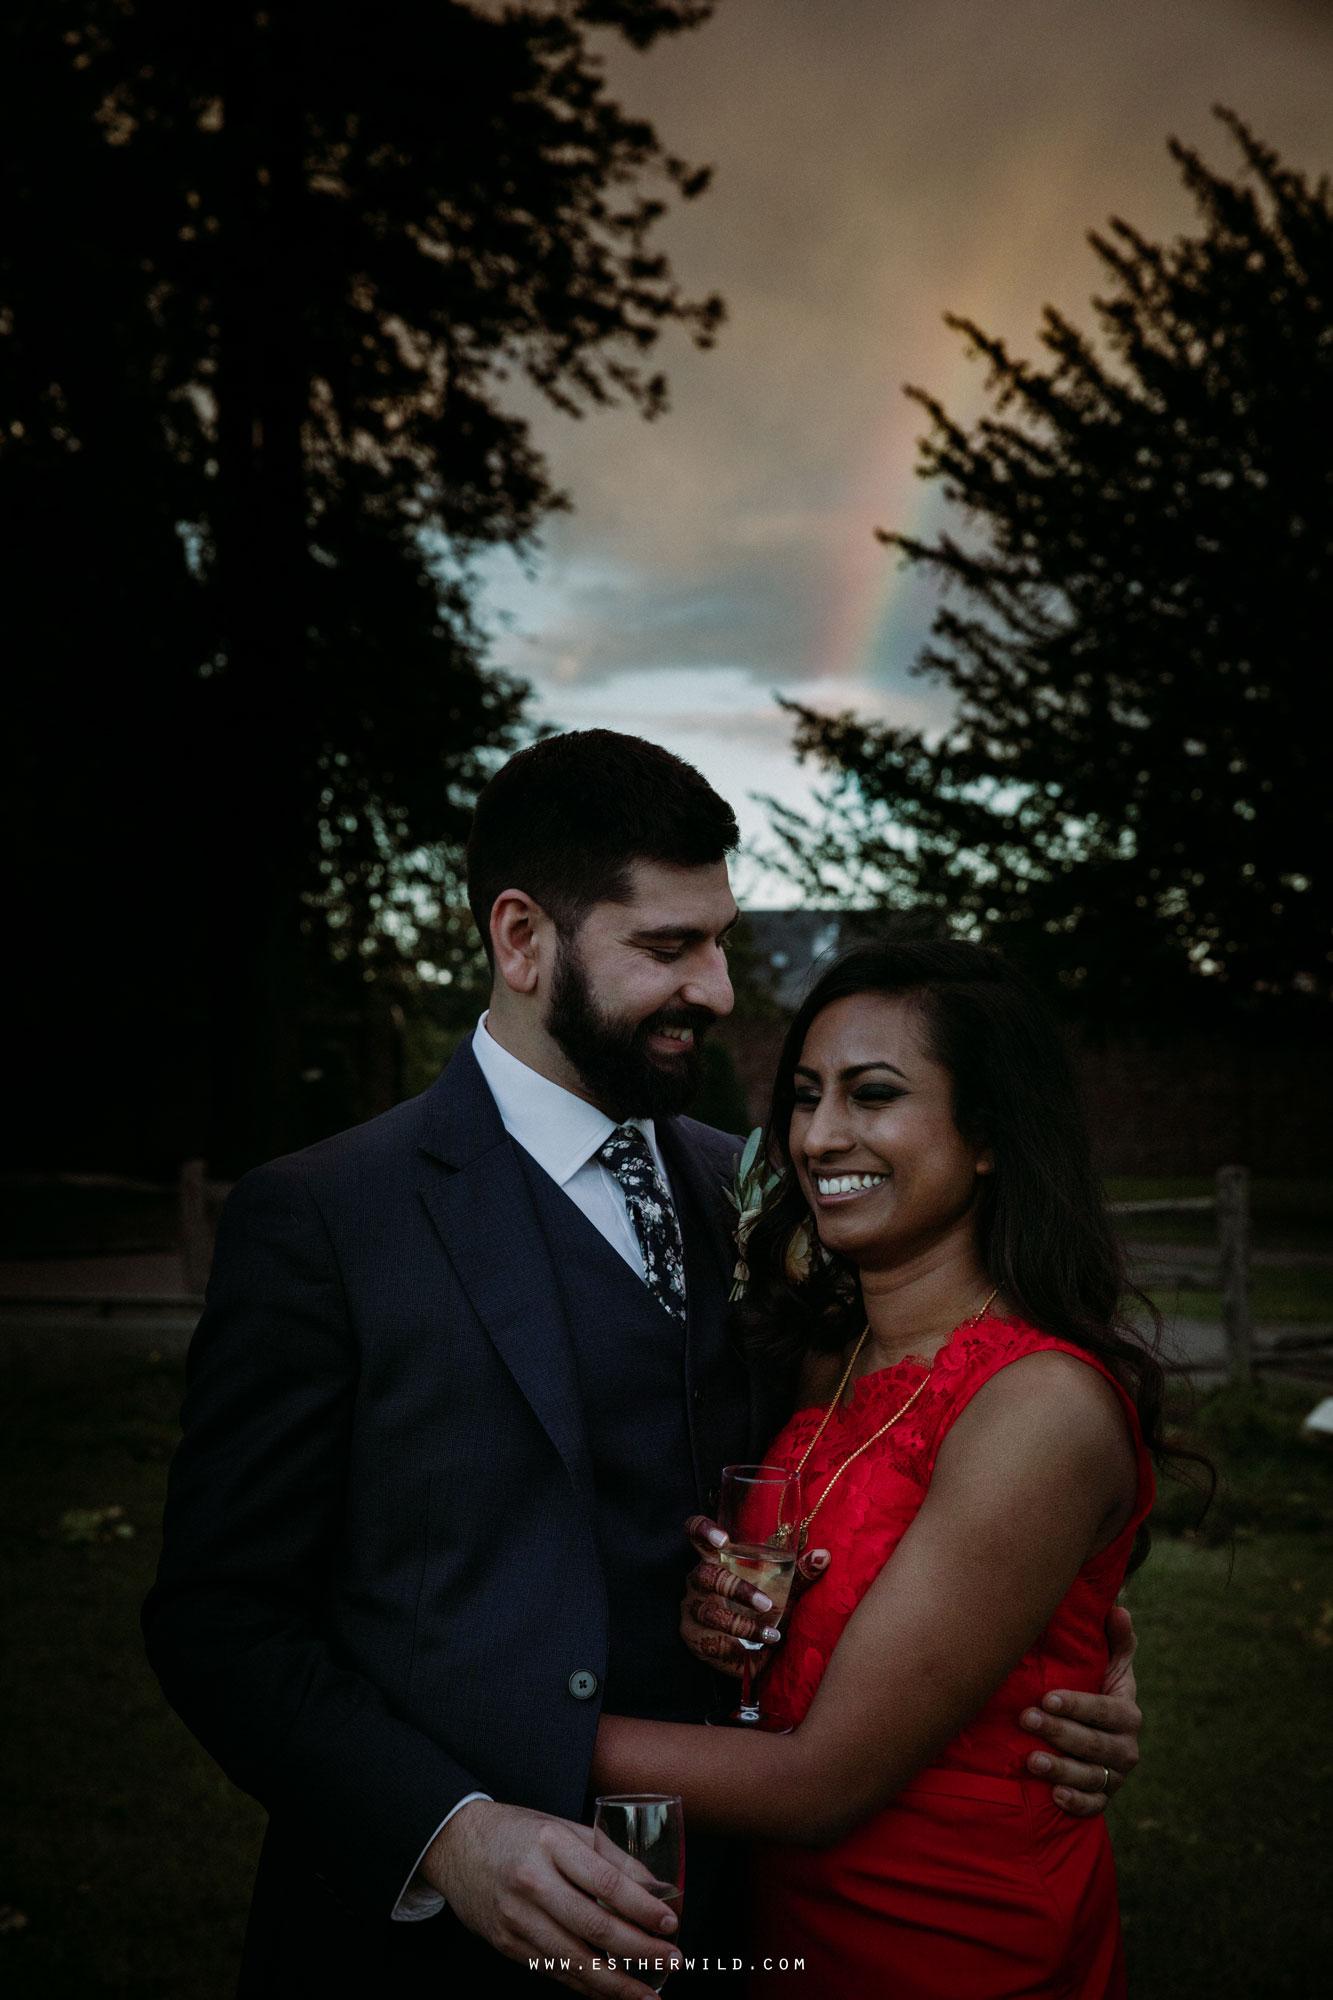 Northbrook_Park_Farnham_Surrey_London_Wedding_Hindu_Fusion_Esther_Wild_Photographer_IMG_6266.jpg